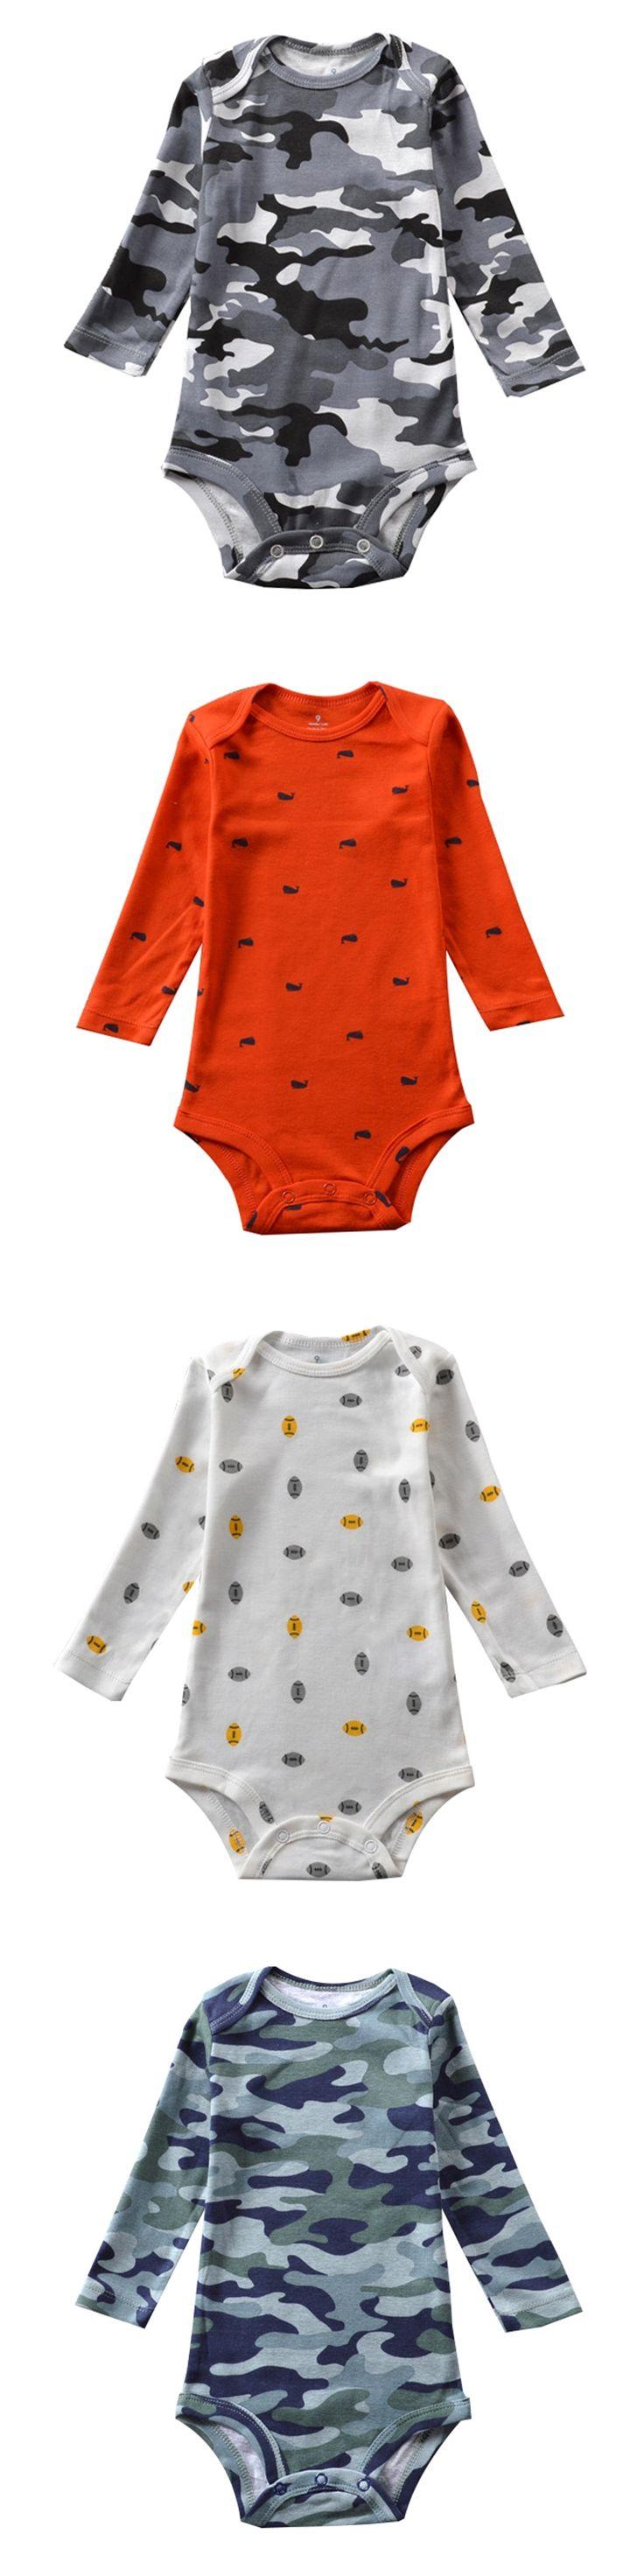 04a82bb1f723 100% top quality c2b8d 076be bebini summer clothes 3 6m 100 cotton ...